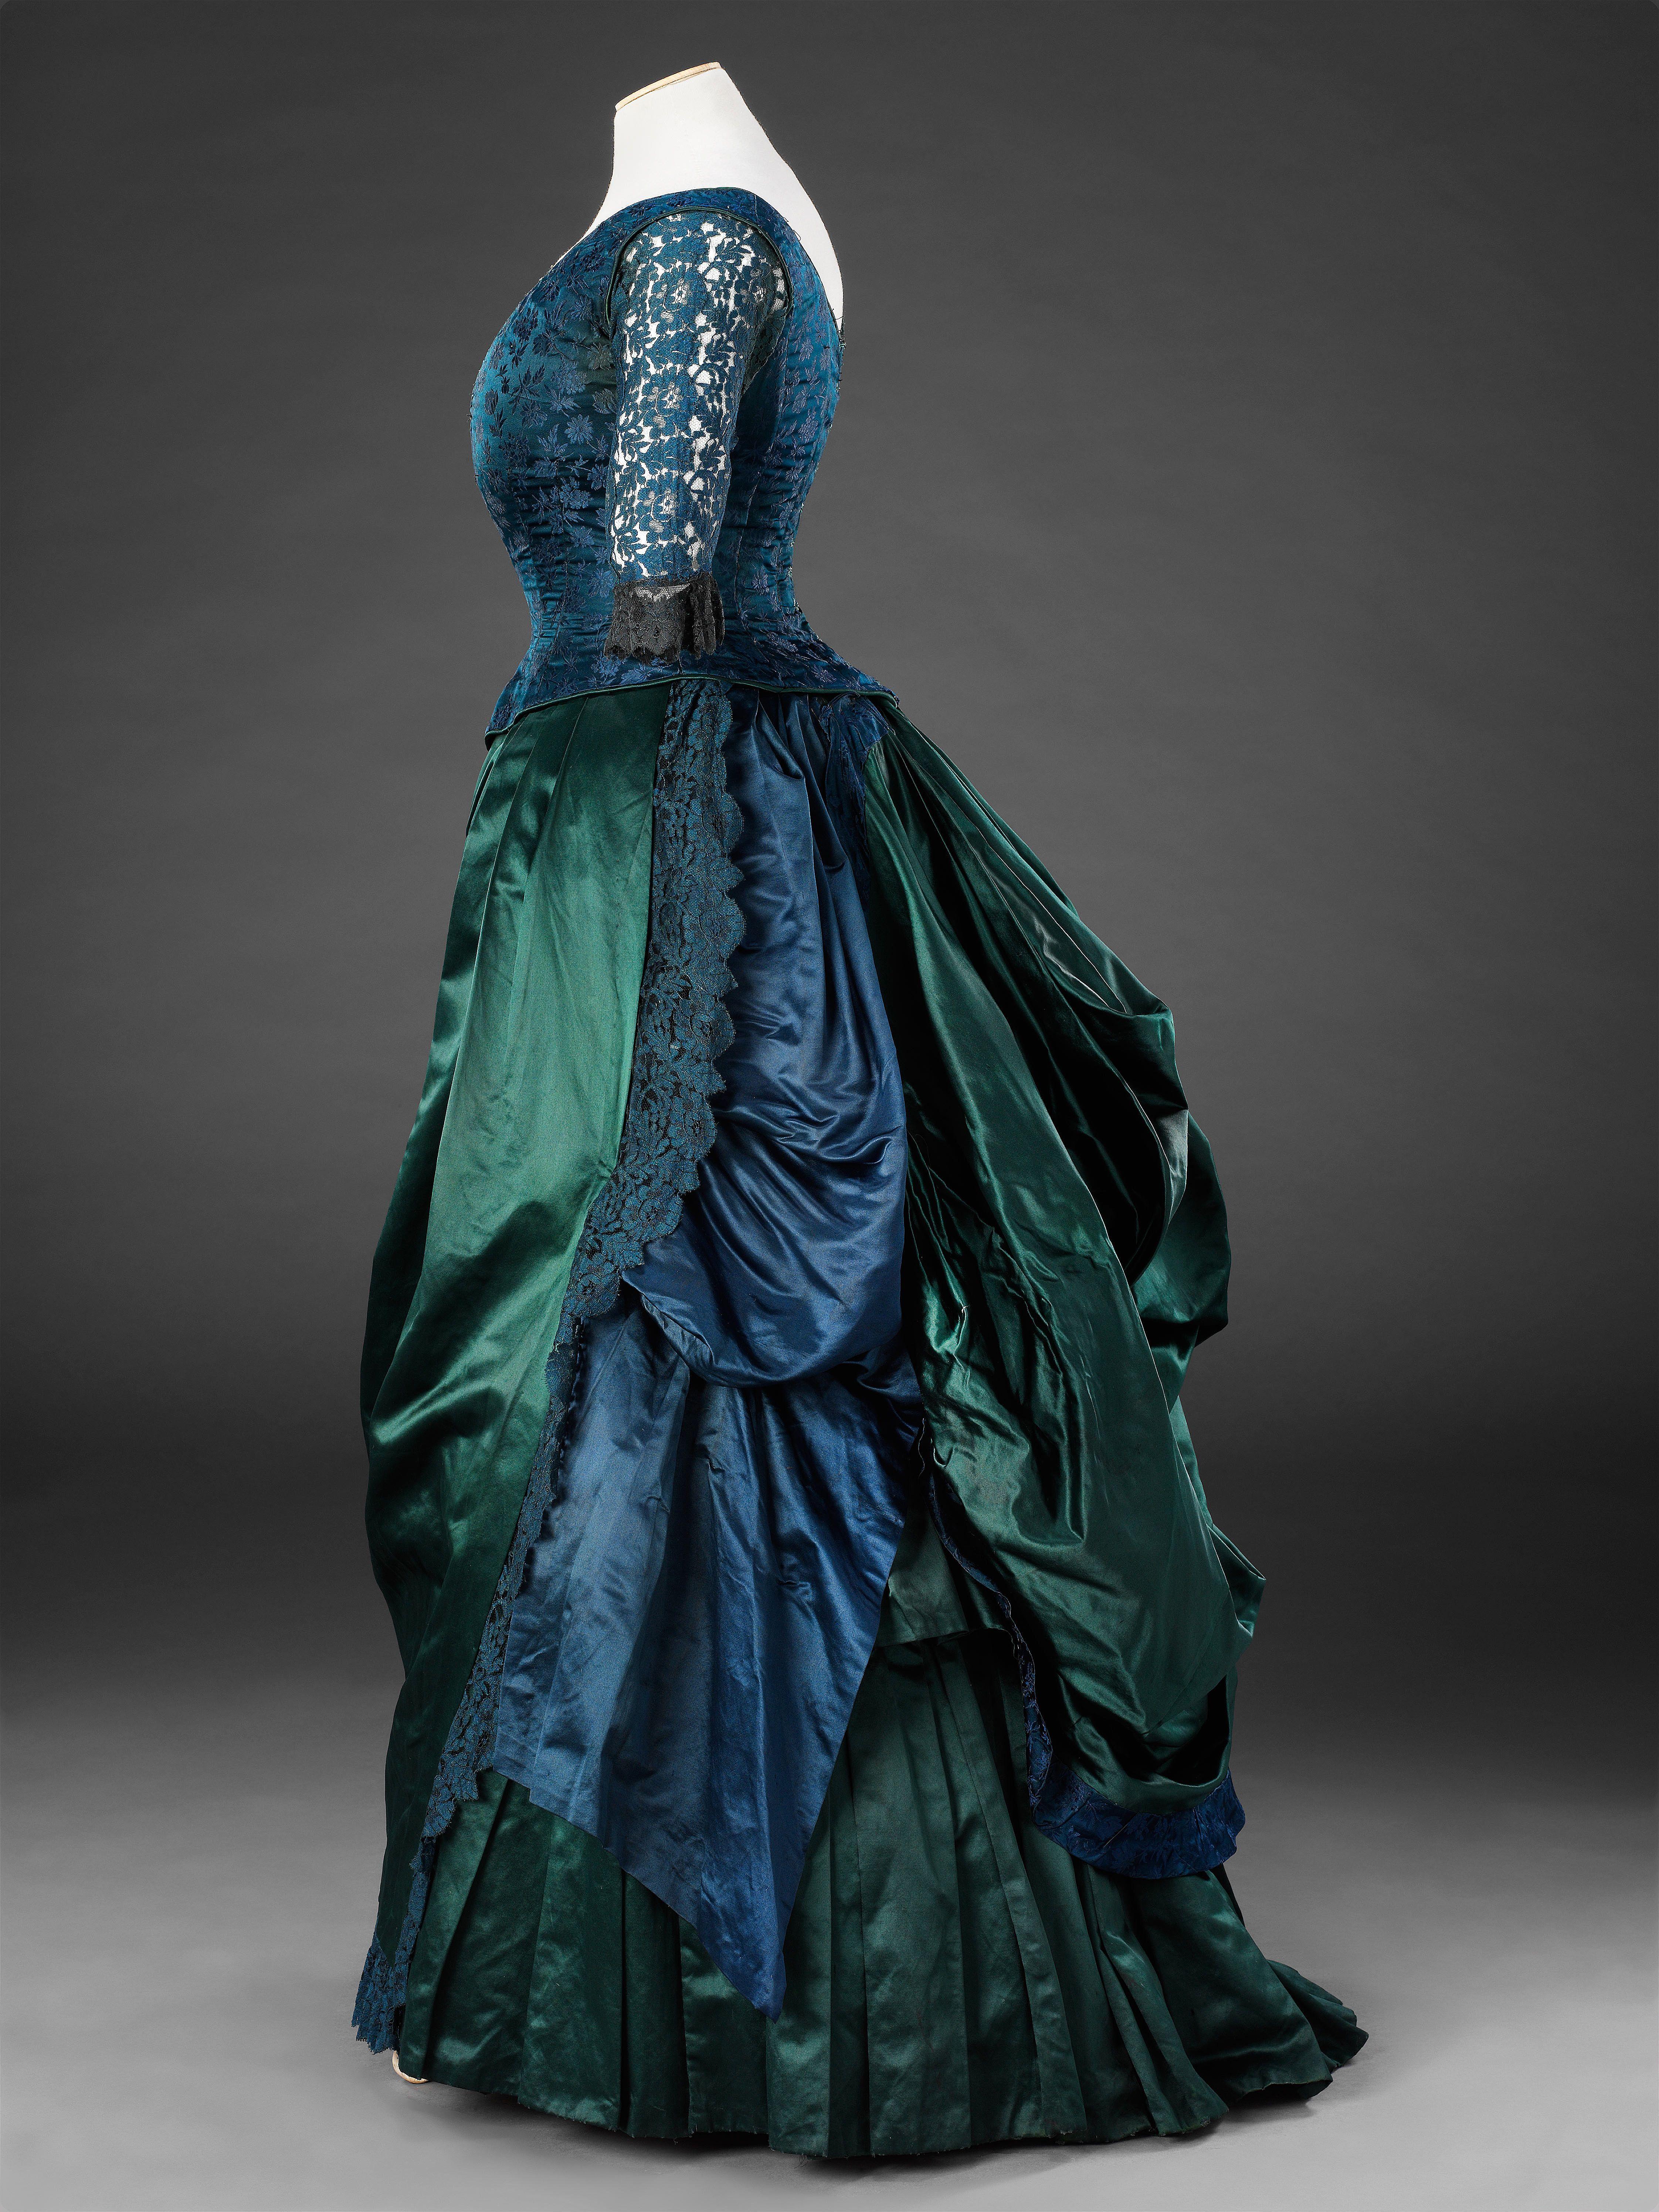 Dress, mid-1880s   Vintage Clothing   Pinterest   Dresses, Fashion ... c36bc8c2b17d